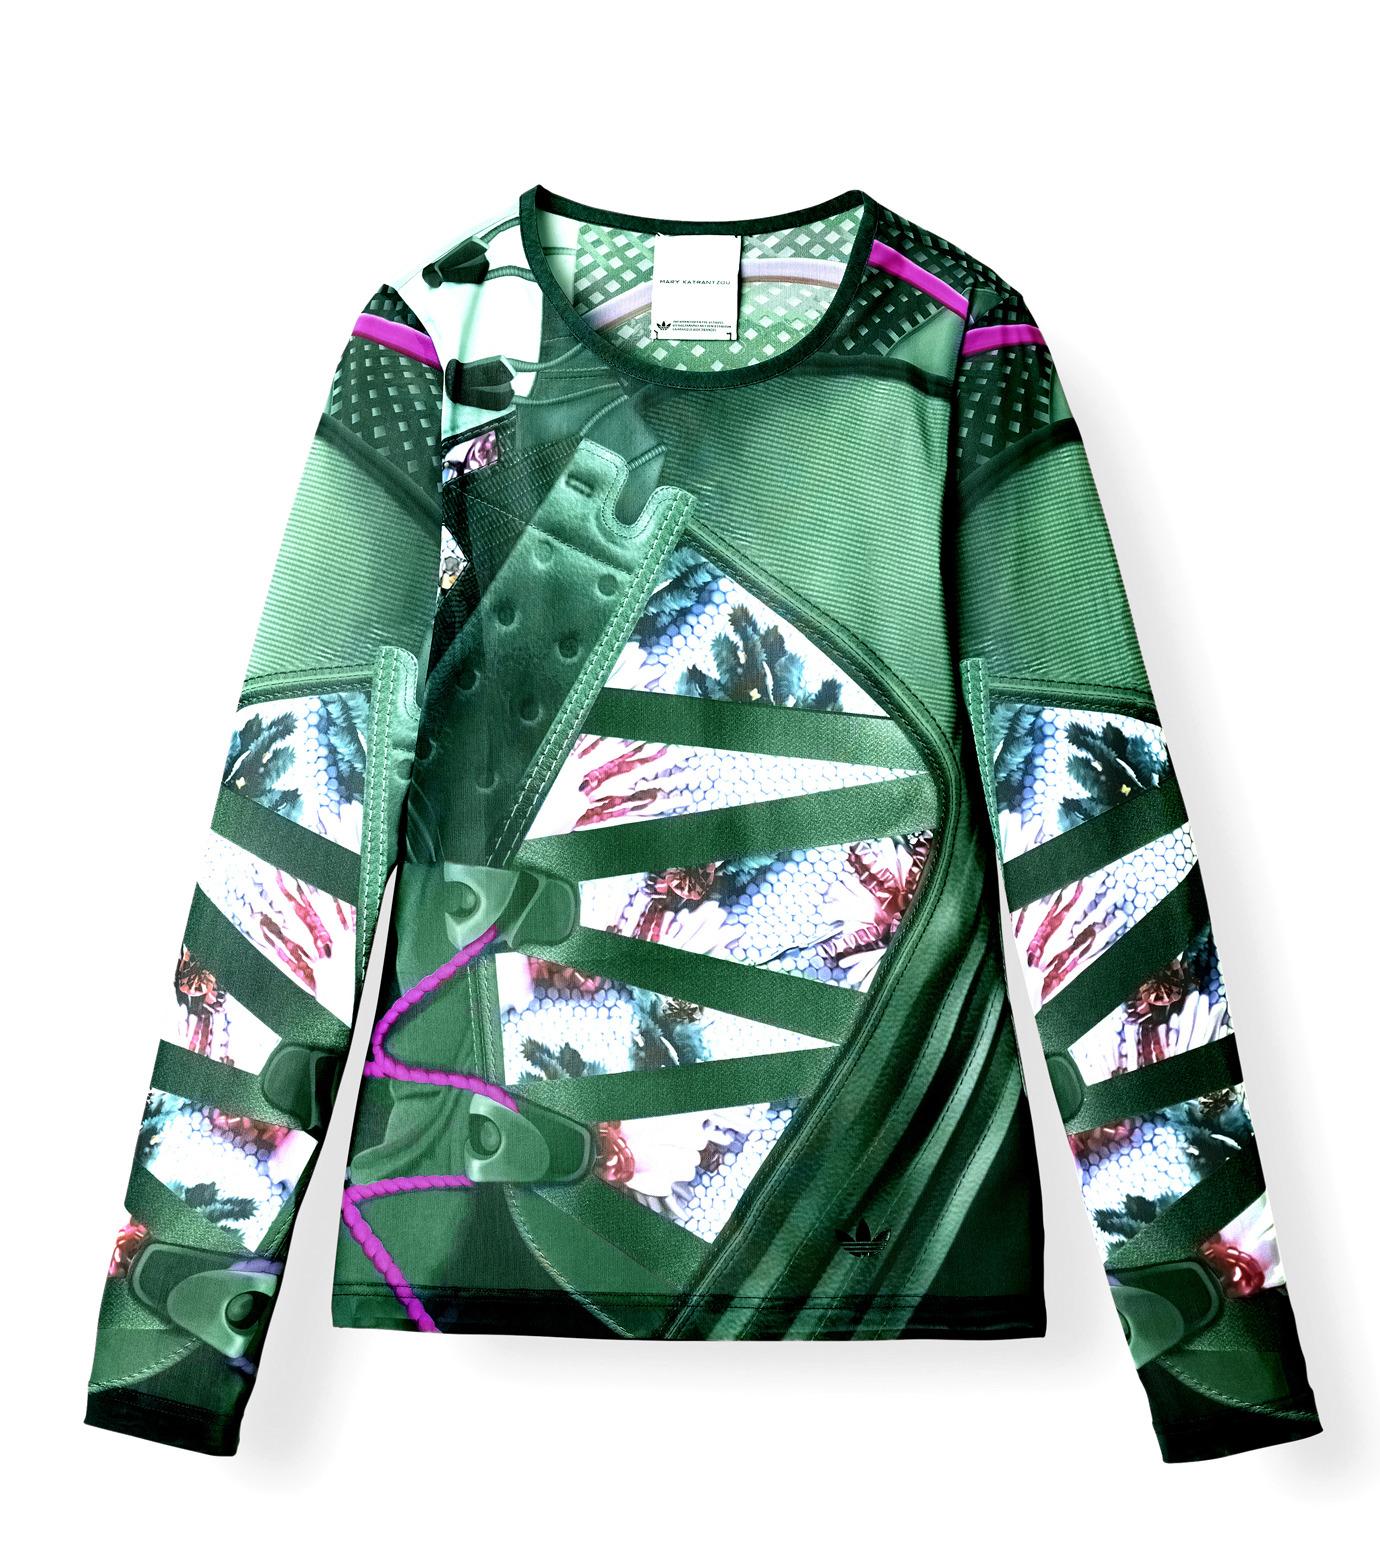 Adidas x Mary Katrantzou(アディダス メアリー・カトランズ)のMesh Fitted Tee-KHAKI-M63056-24 拡大詳細画像1